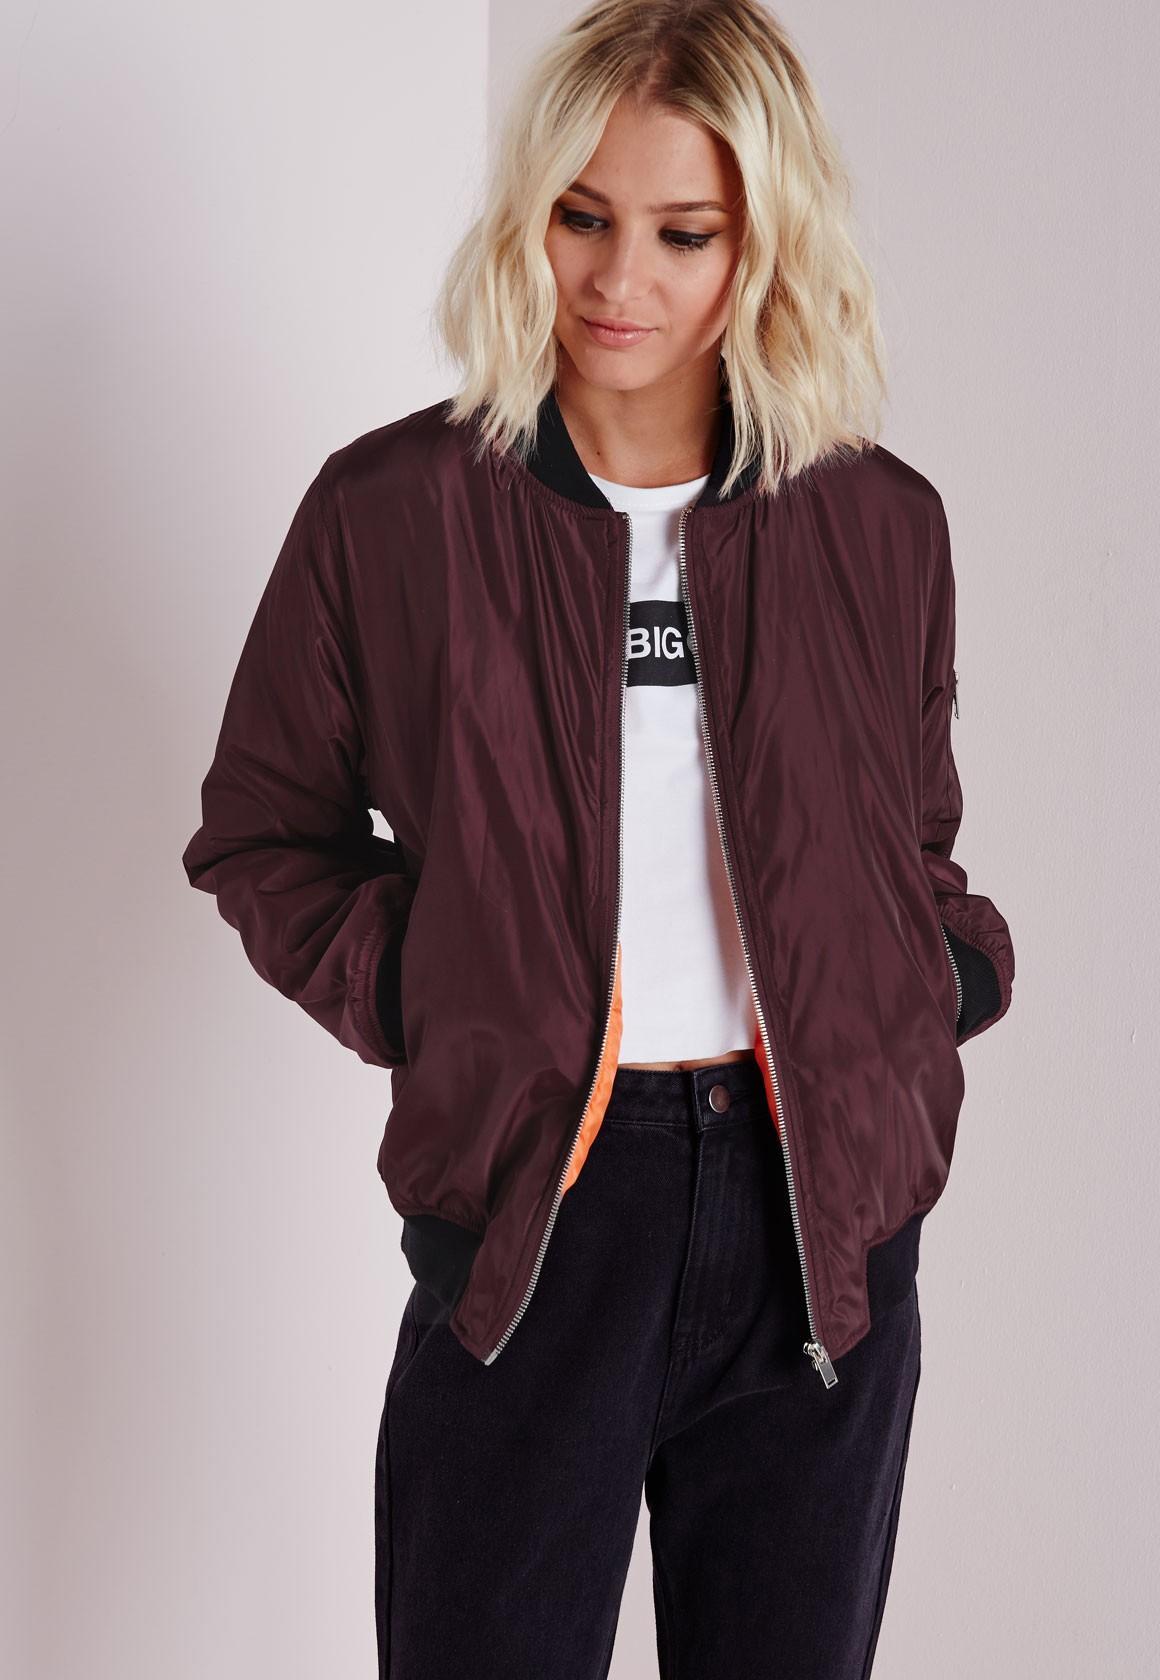 pic-6-winter-fashion